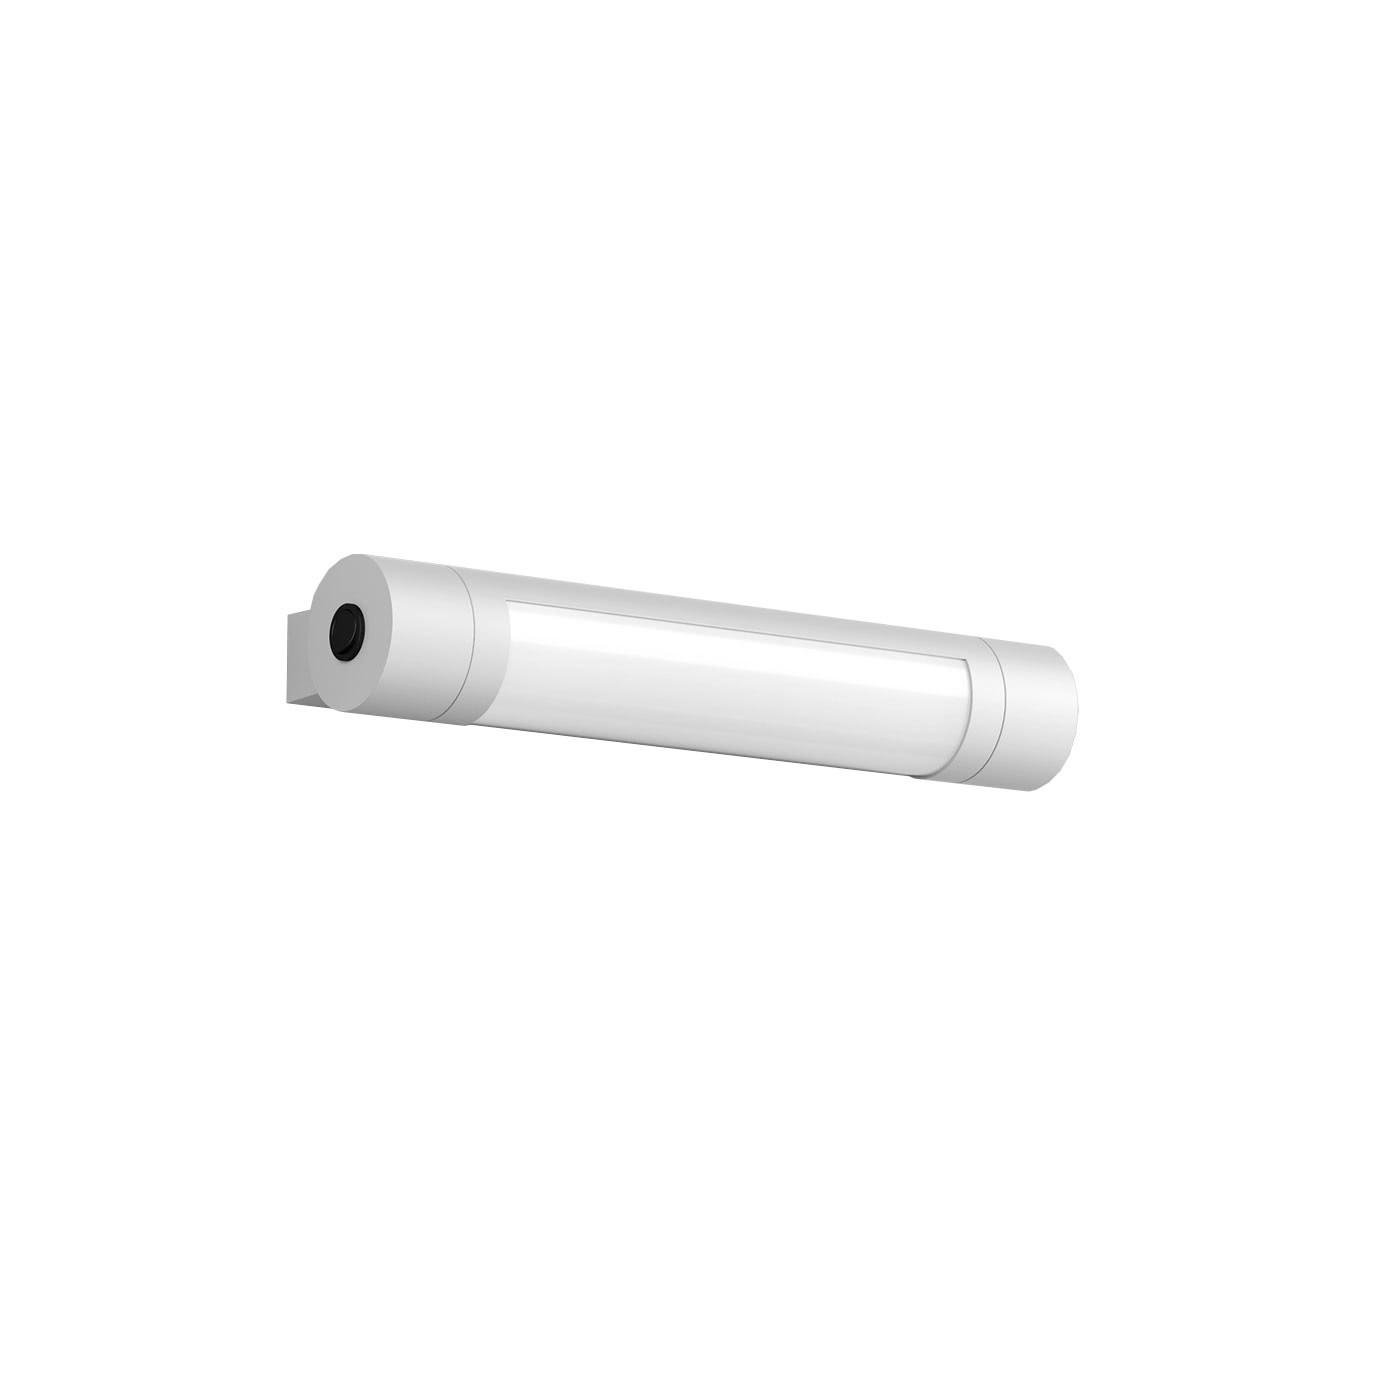 Bega Variata 2 Wandleuchte LED, 30 cm